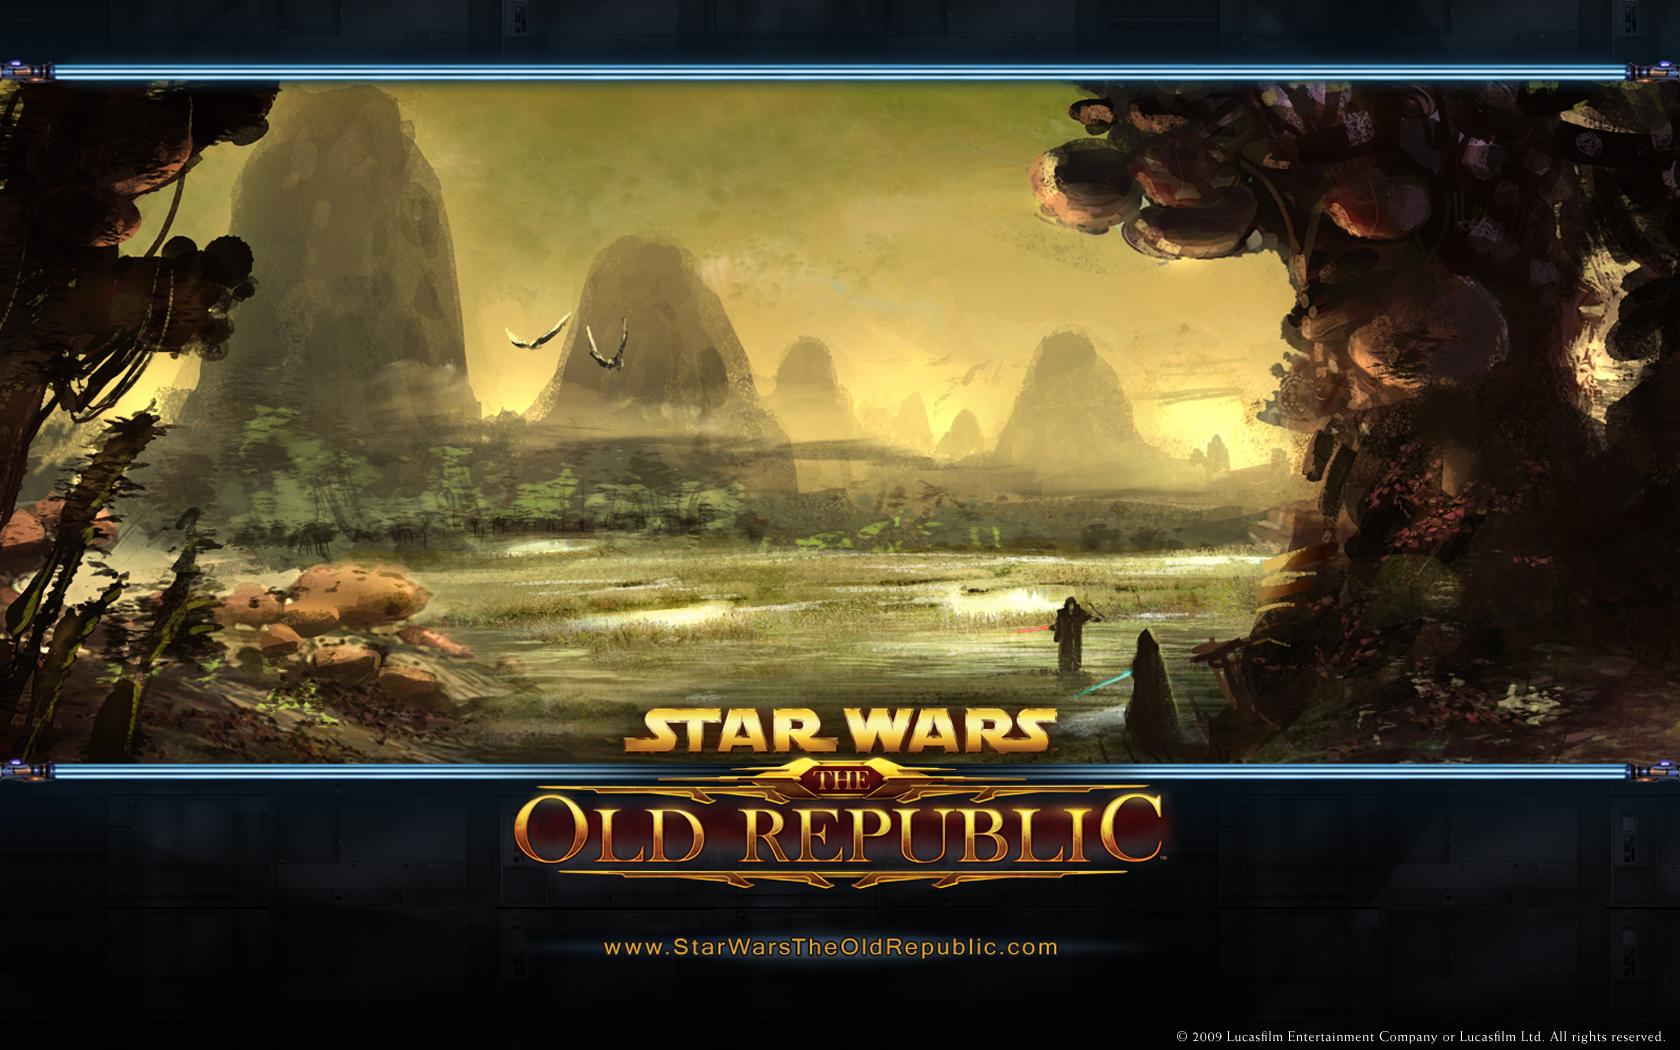 642_2202.jpg - Star Wars: The Old Republic